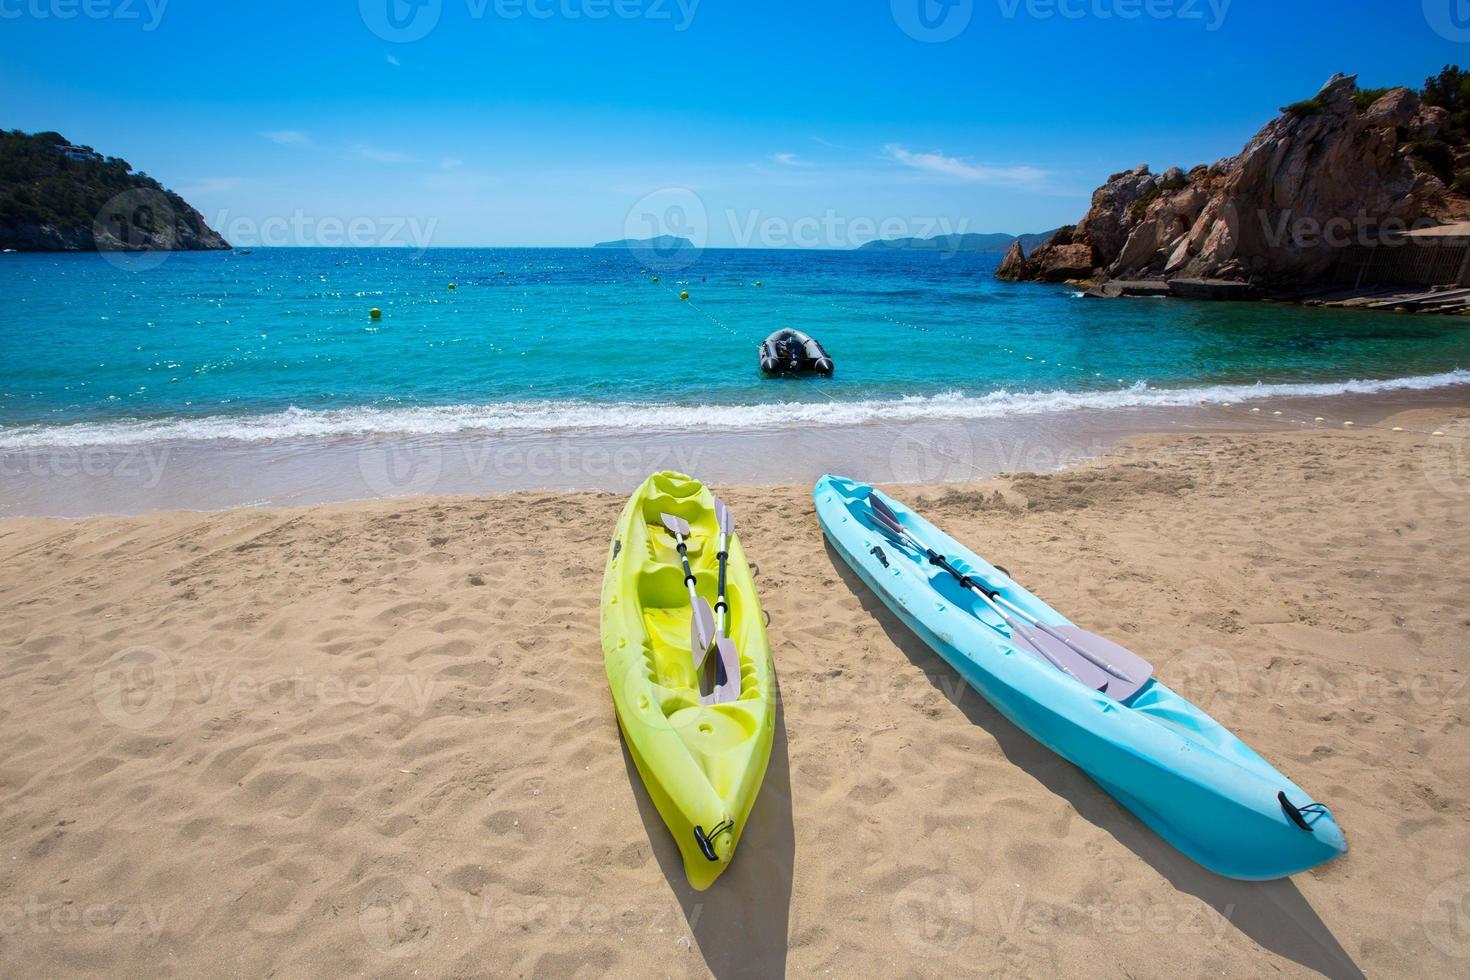 ibiza cala sant vicent strand met kajaks san juan foto